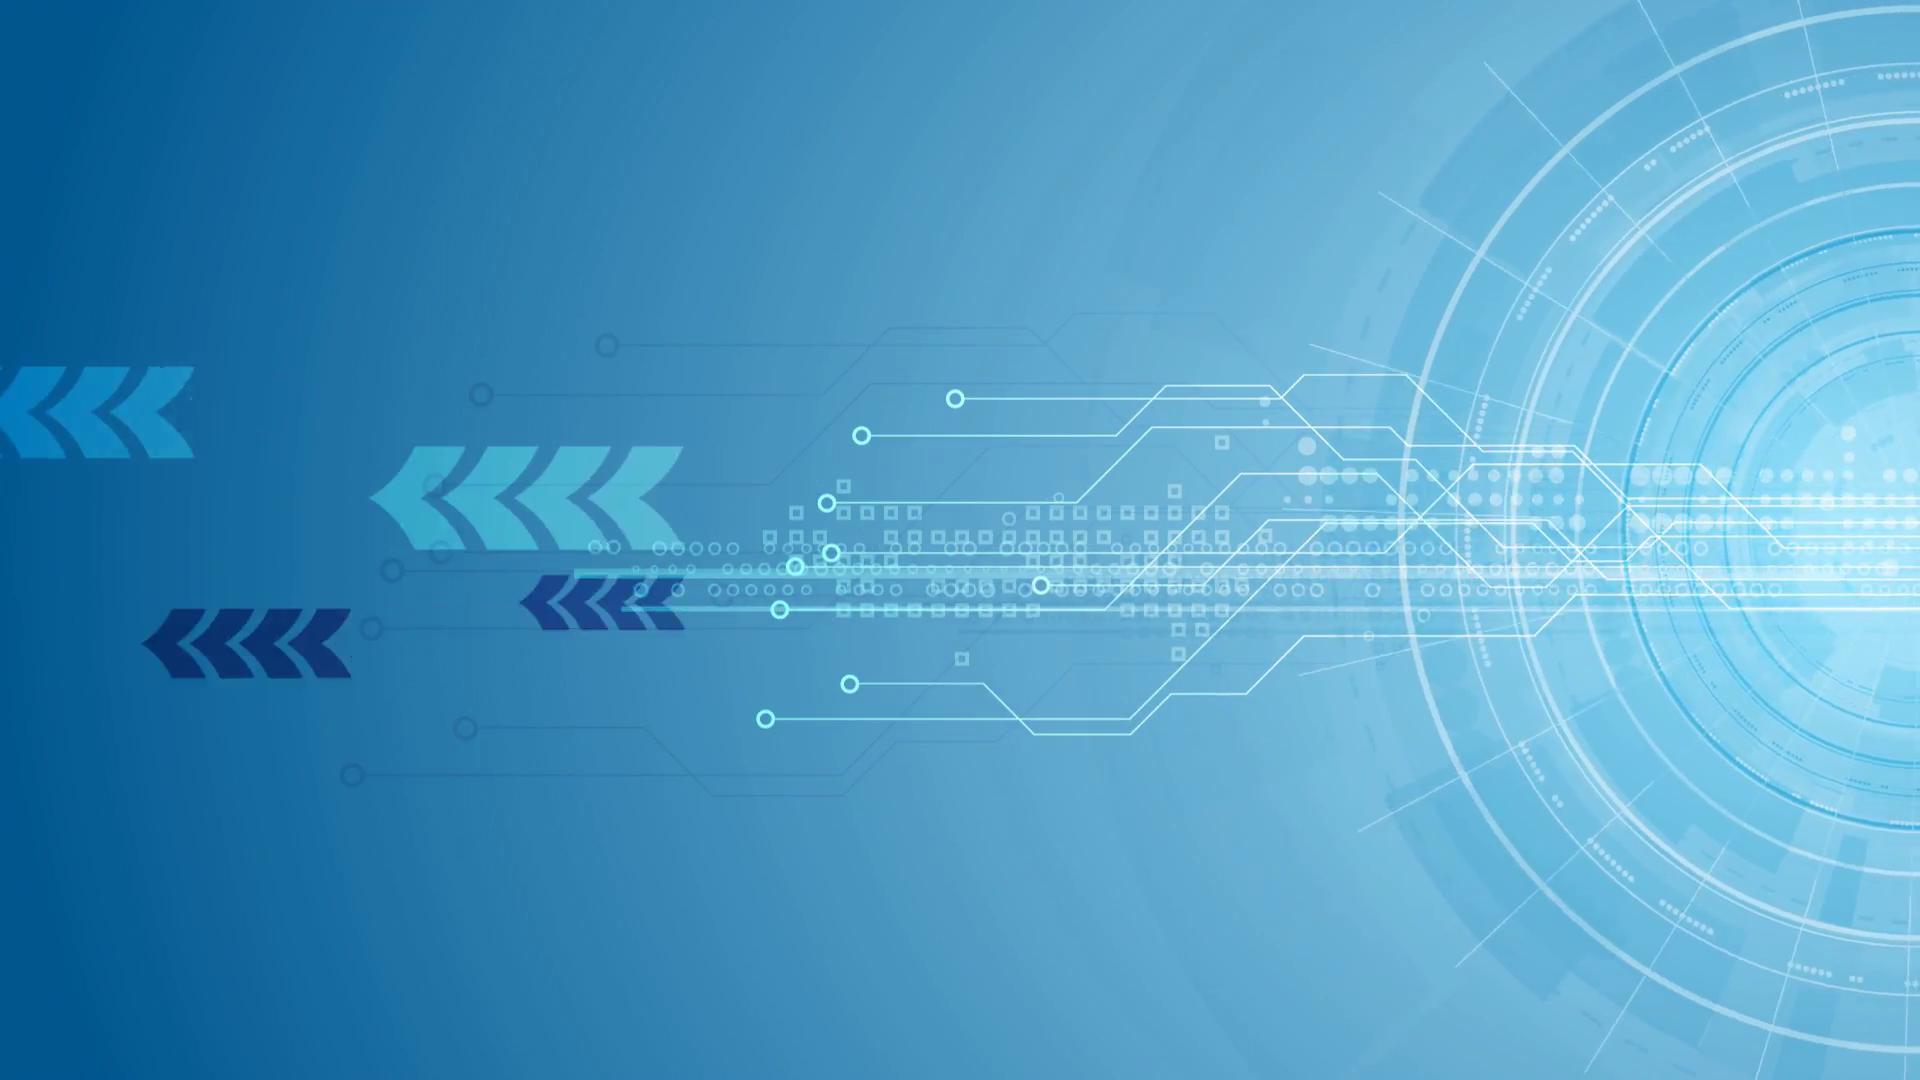 technical data package template - localizaci n gps zainder soluciones tecnol gicaszainder